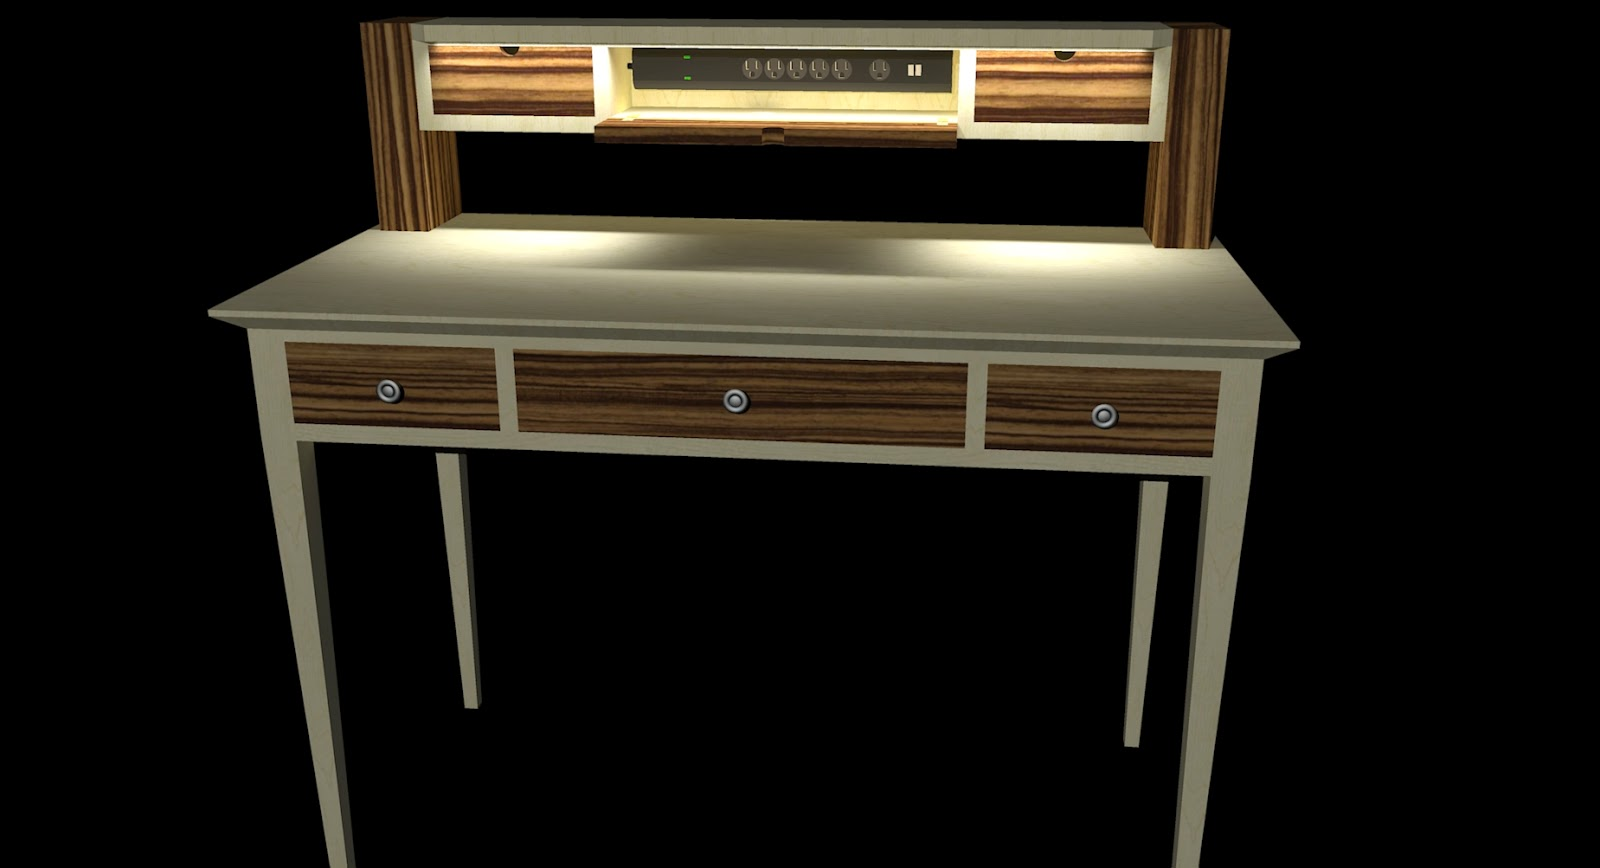 la varlope secr taire contemporain. Black Bedroom Furniture Sets. Home Design Ideas